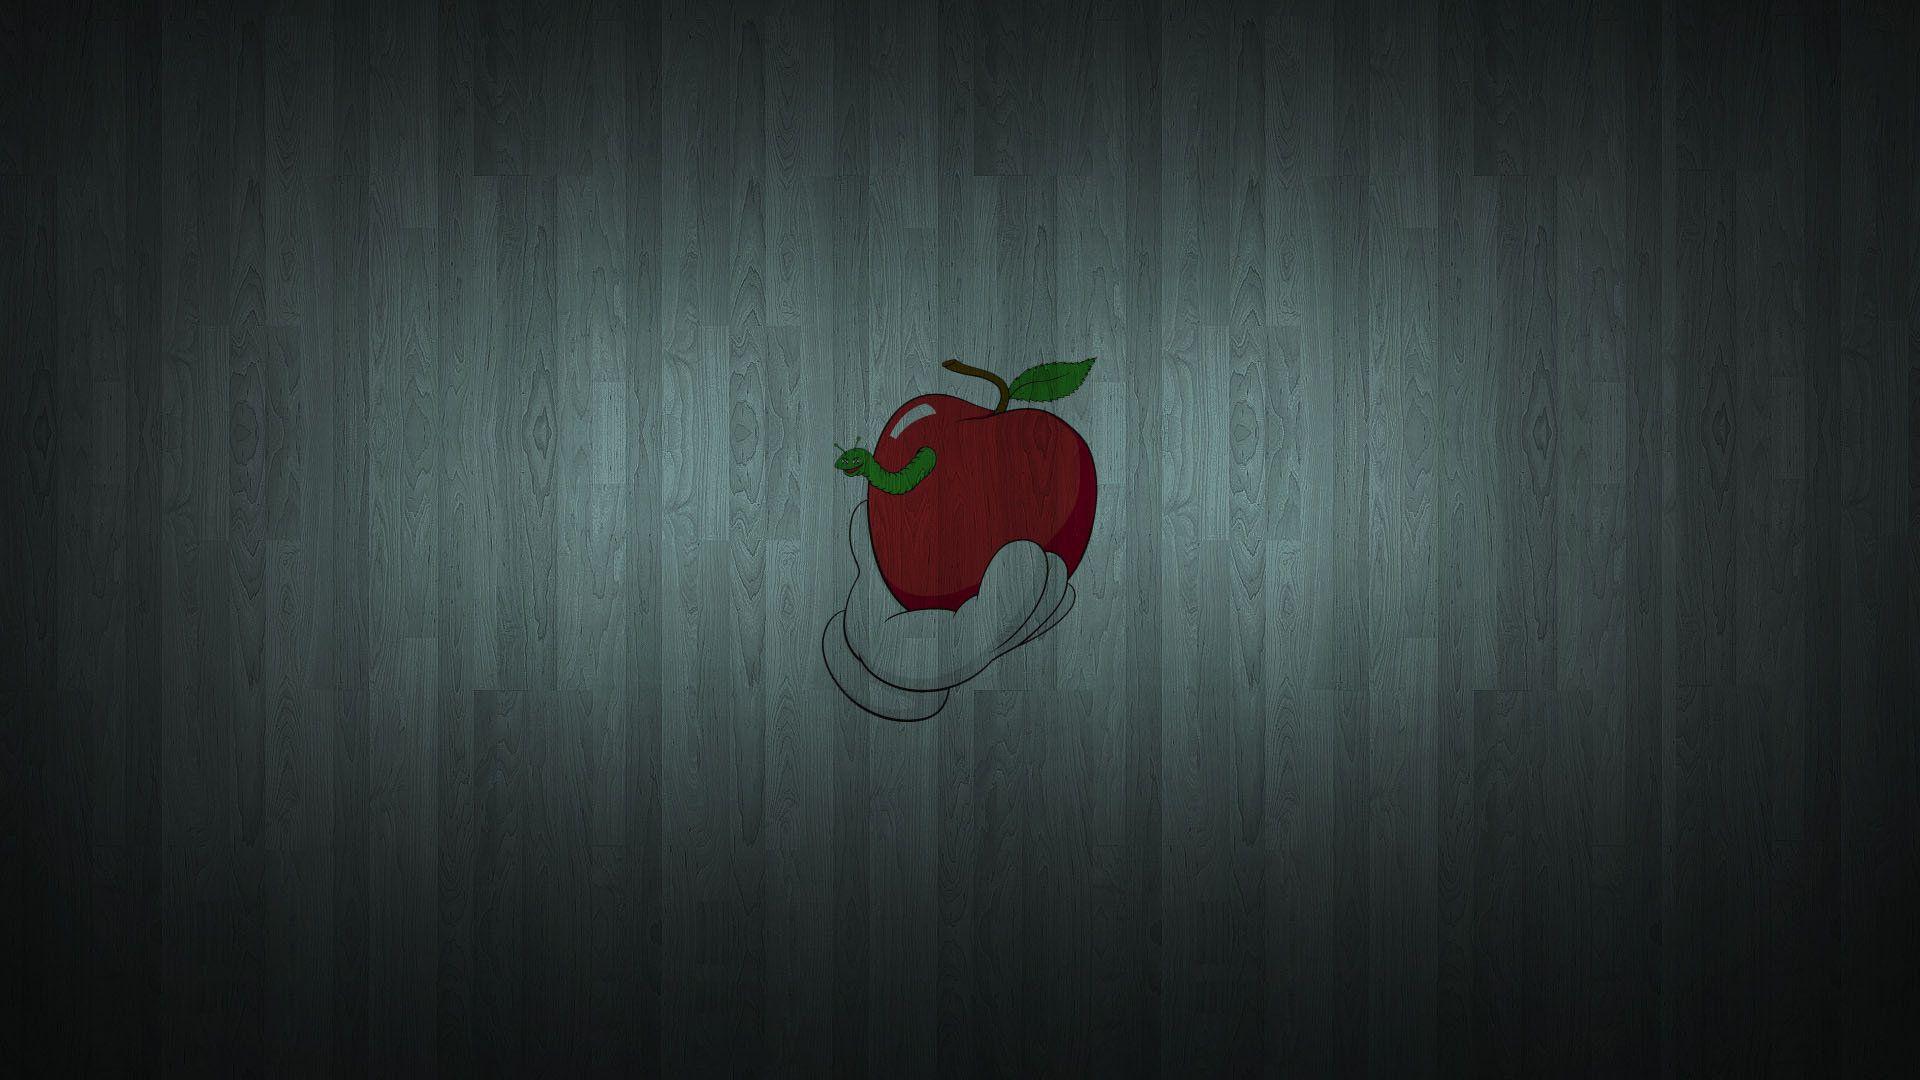 Wallpaper For Apple Computer